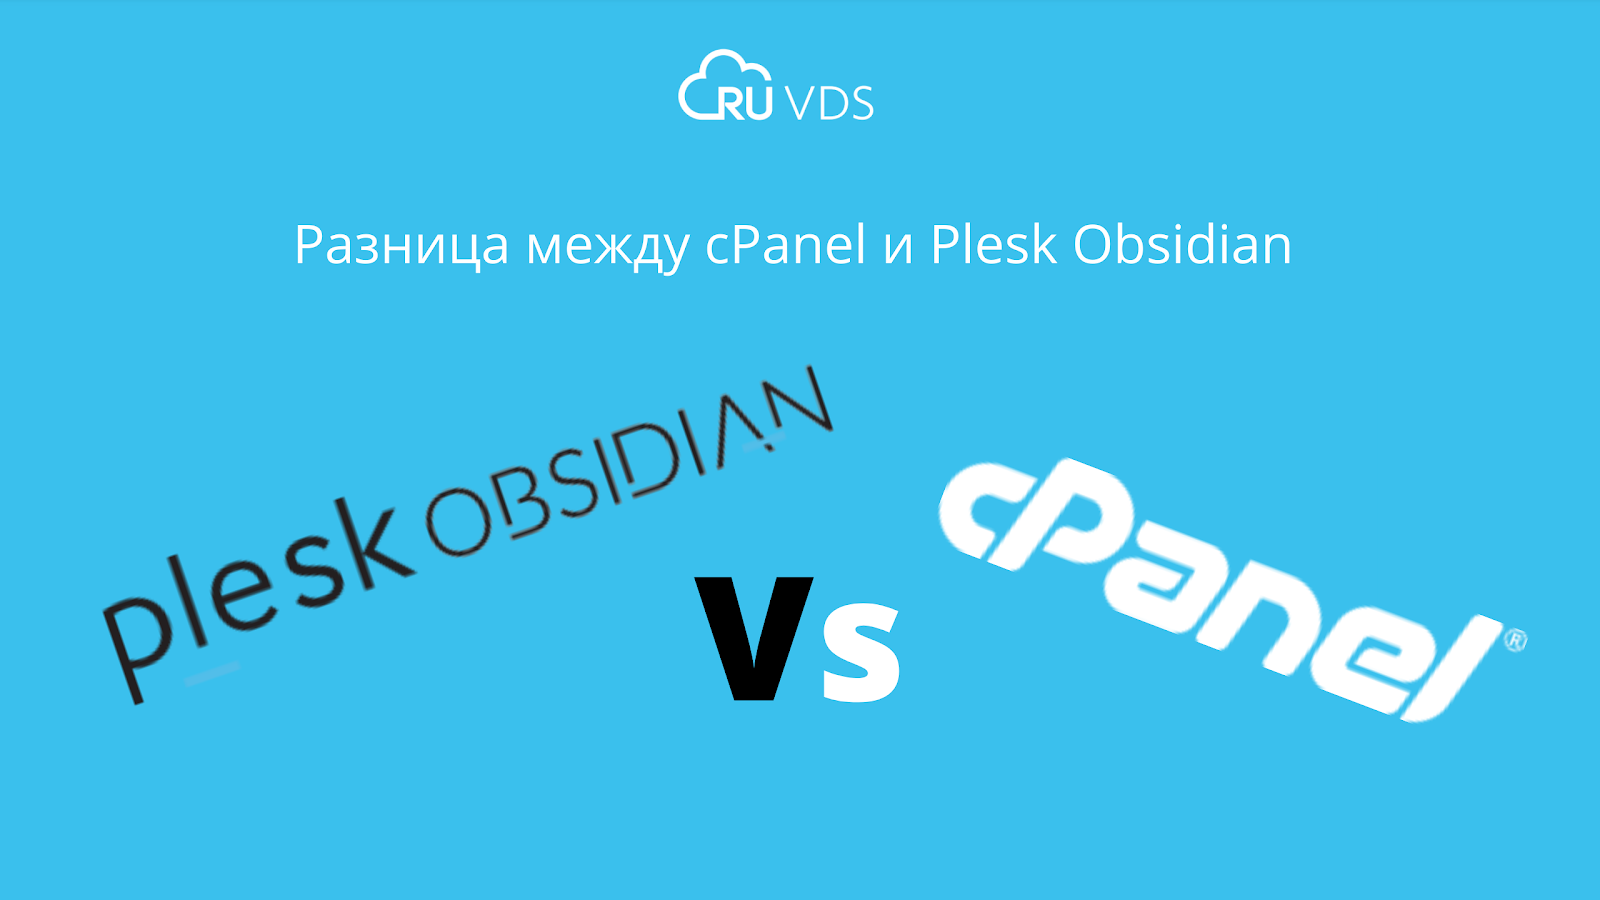 Разница между cPanel и Plesk Obsidian - 1